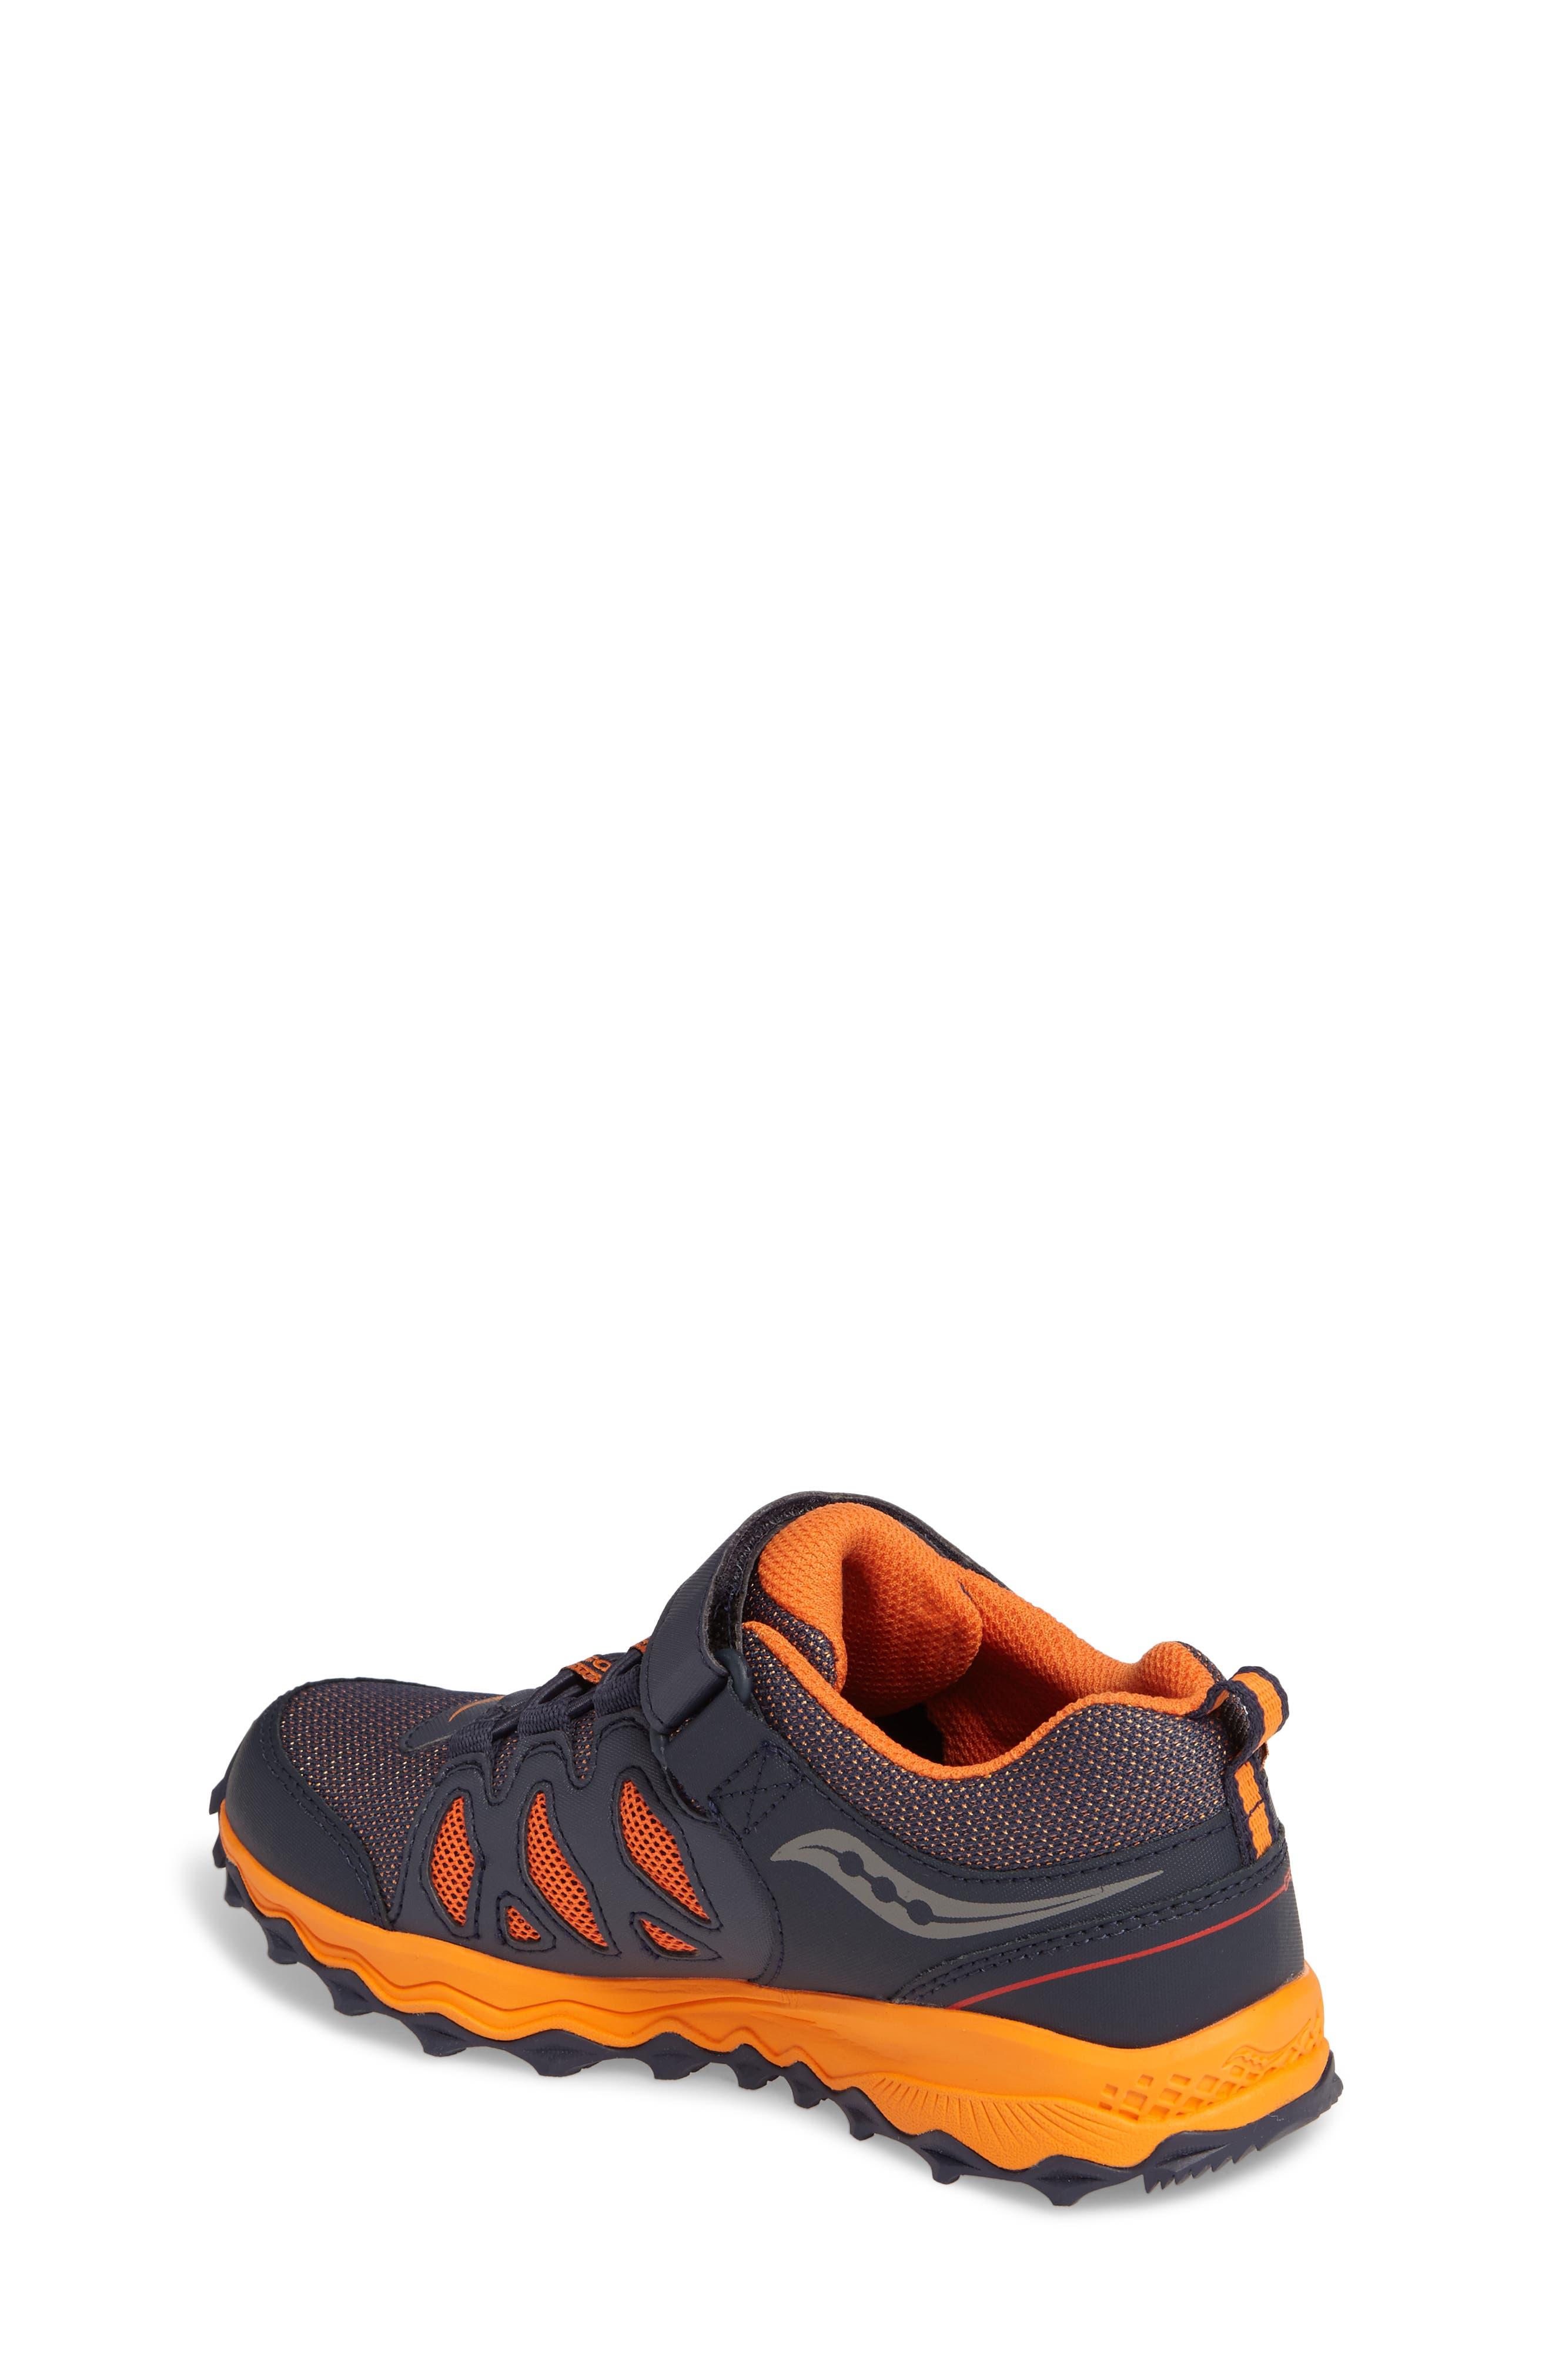 Peregrine Shield Water-Resistant Sneaker,                             Alternate thumbnail 2, color,                             Navy/ Orange